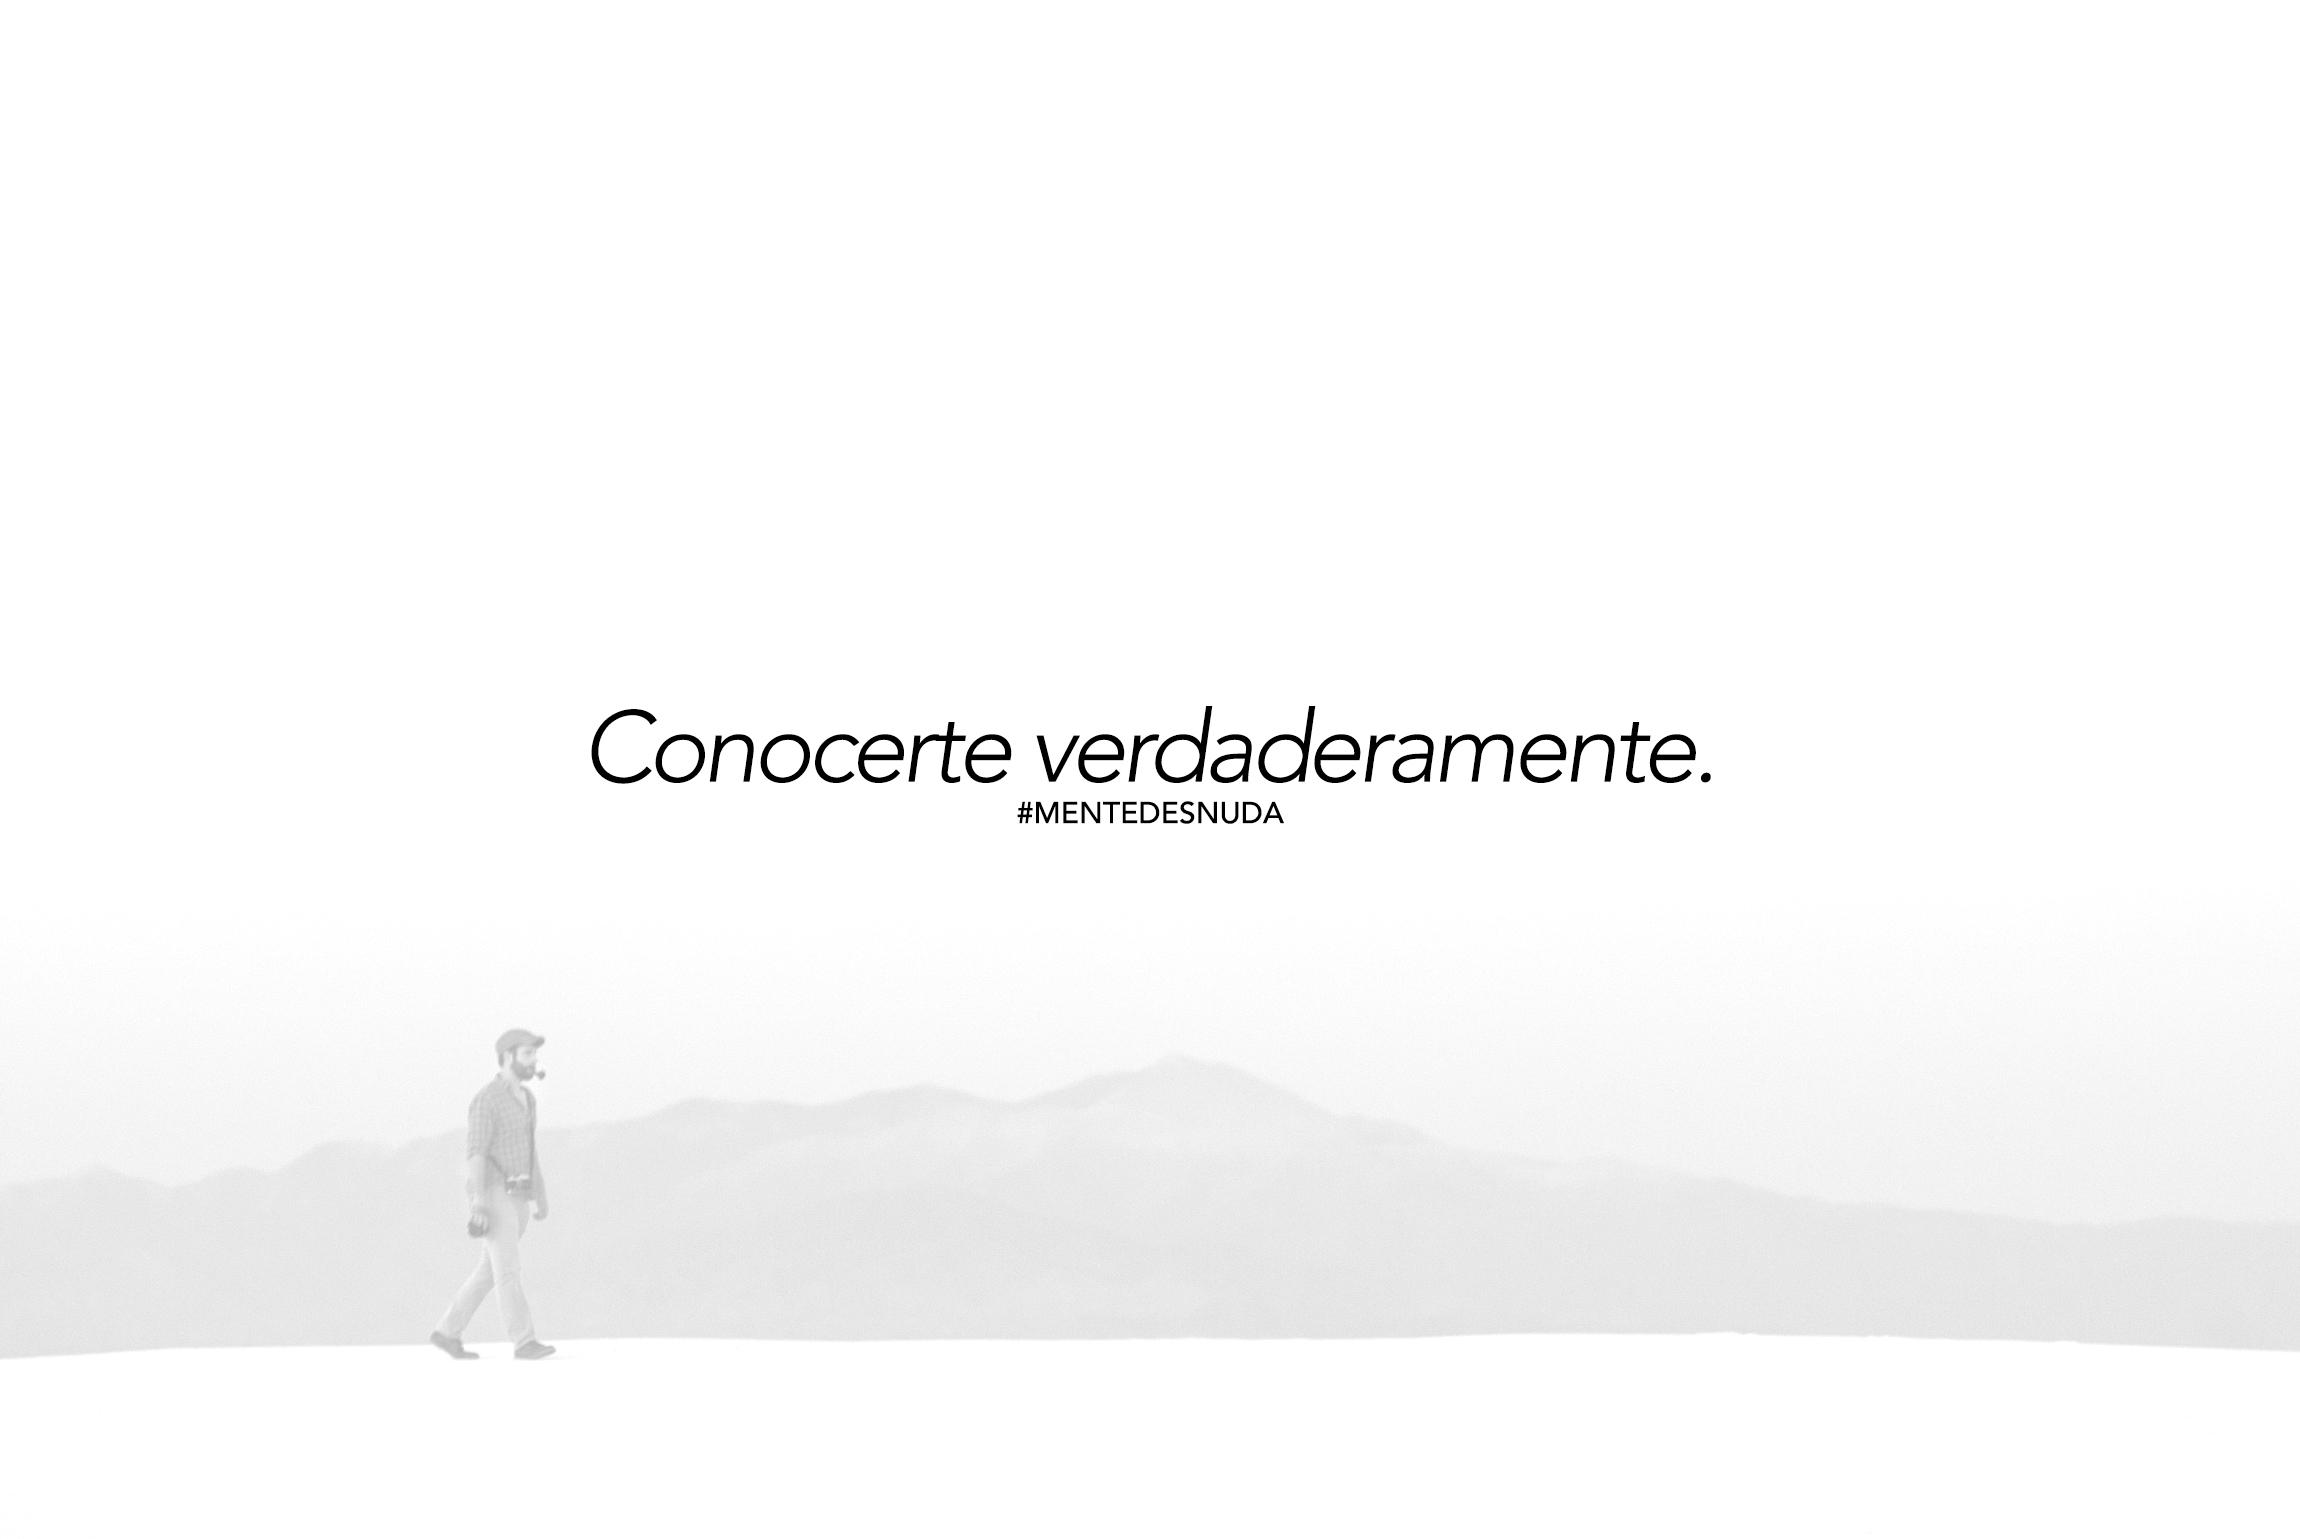 CONOCETE2